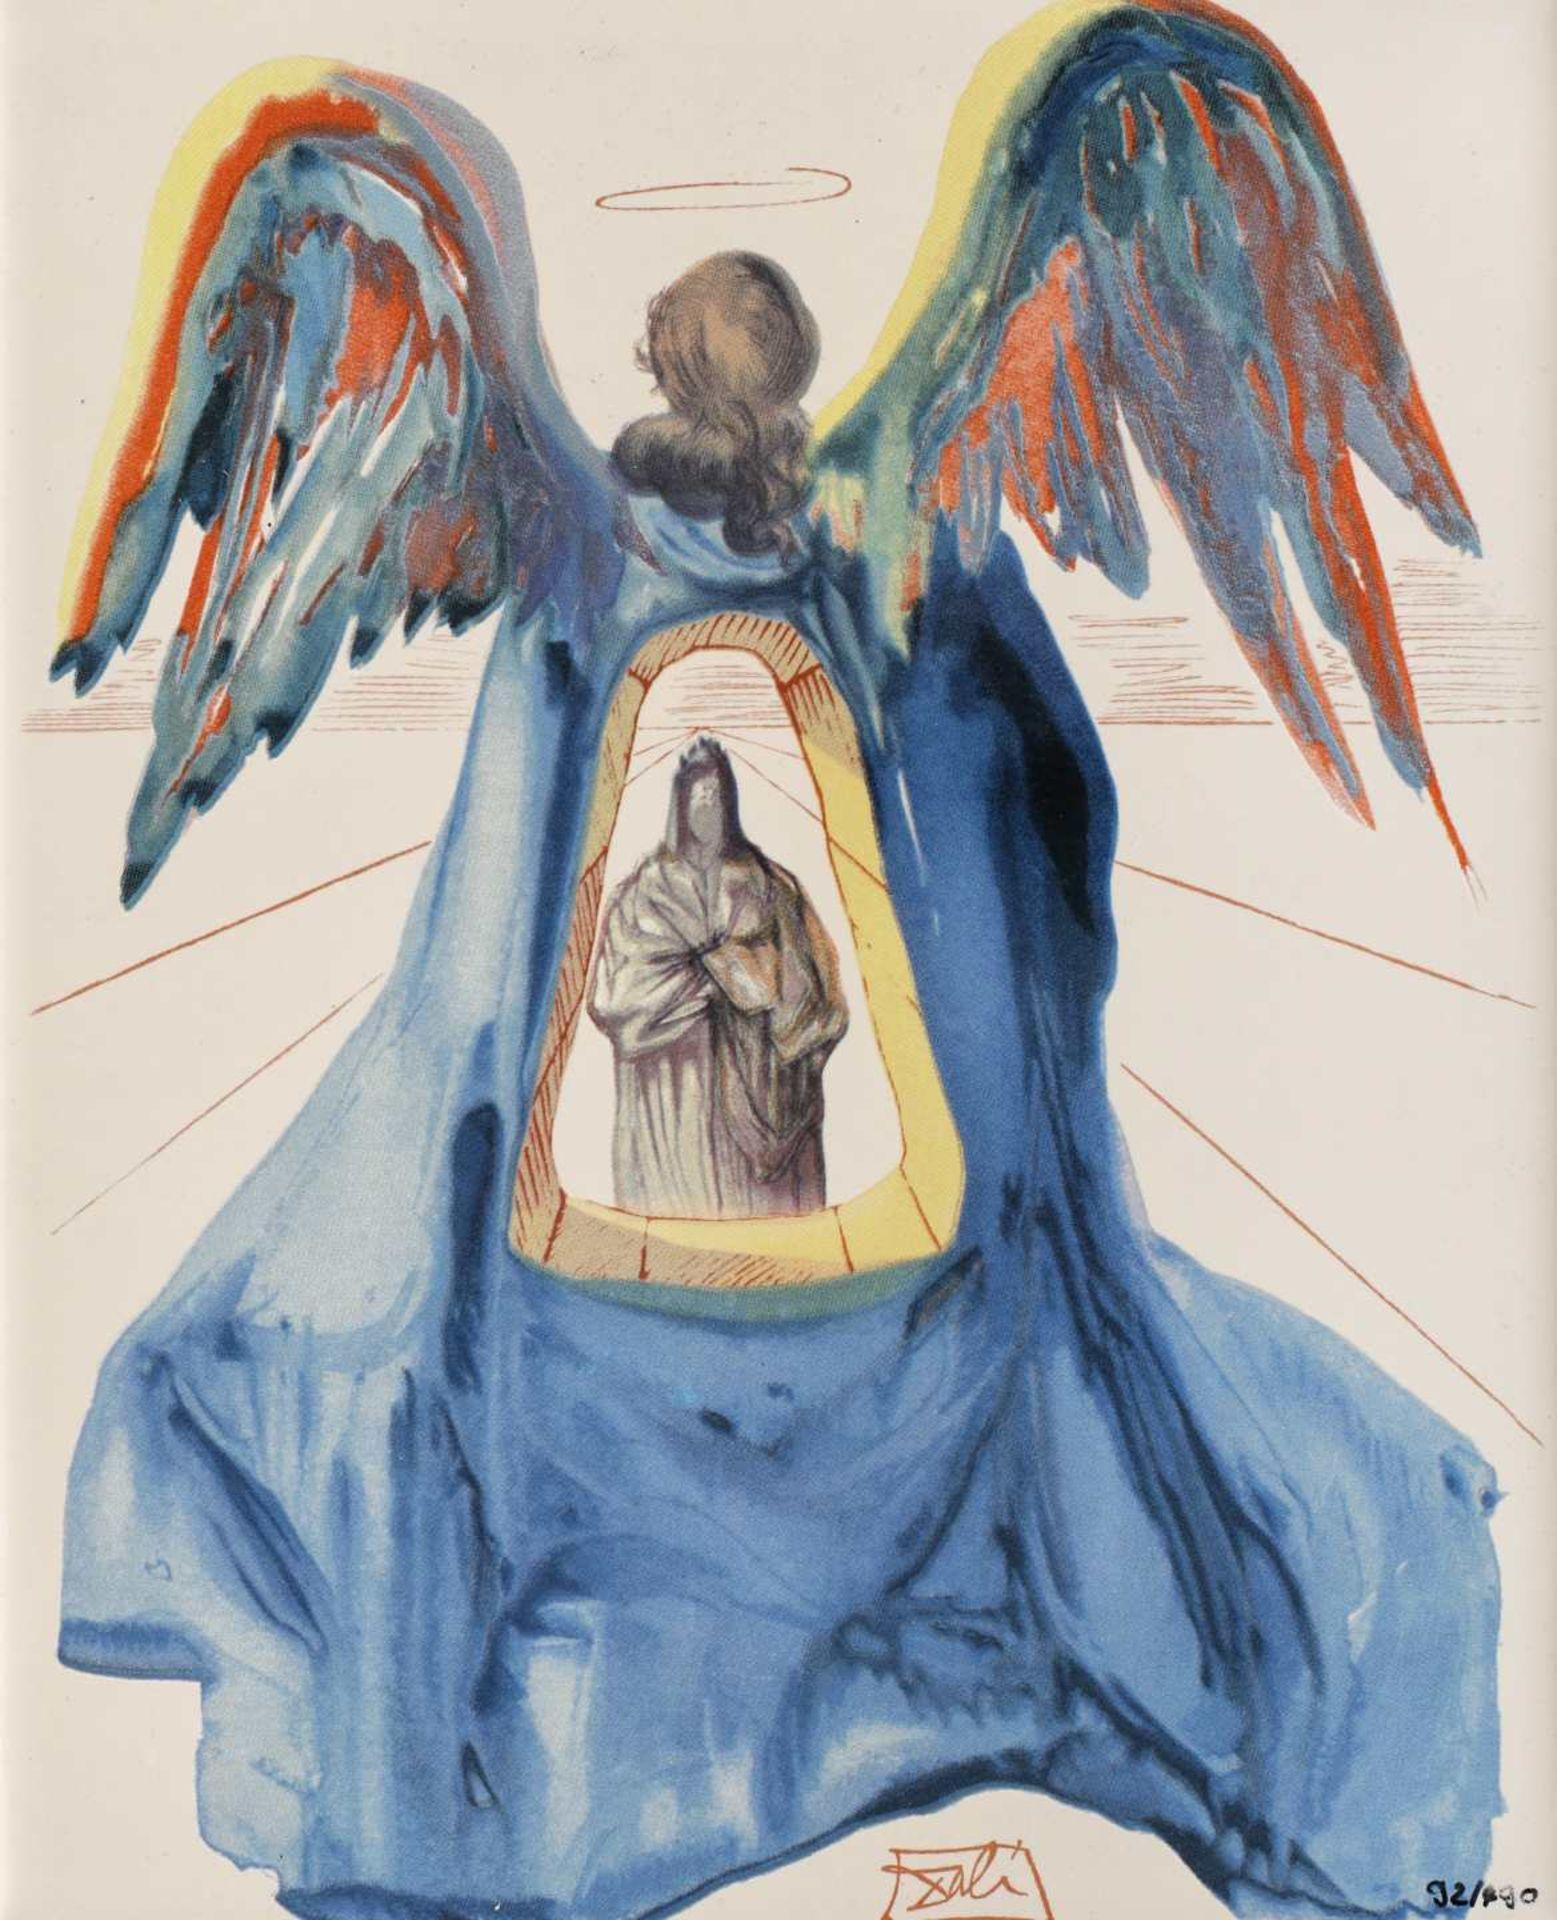 Salvador Dali, Dante PurifiedSalvador Dali, Dante Purified, screen printing on ceramic, 25 × 2